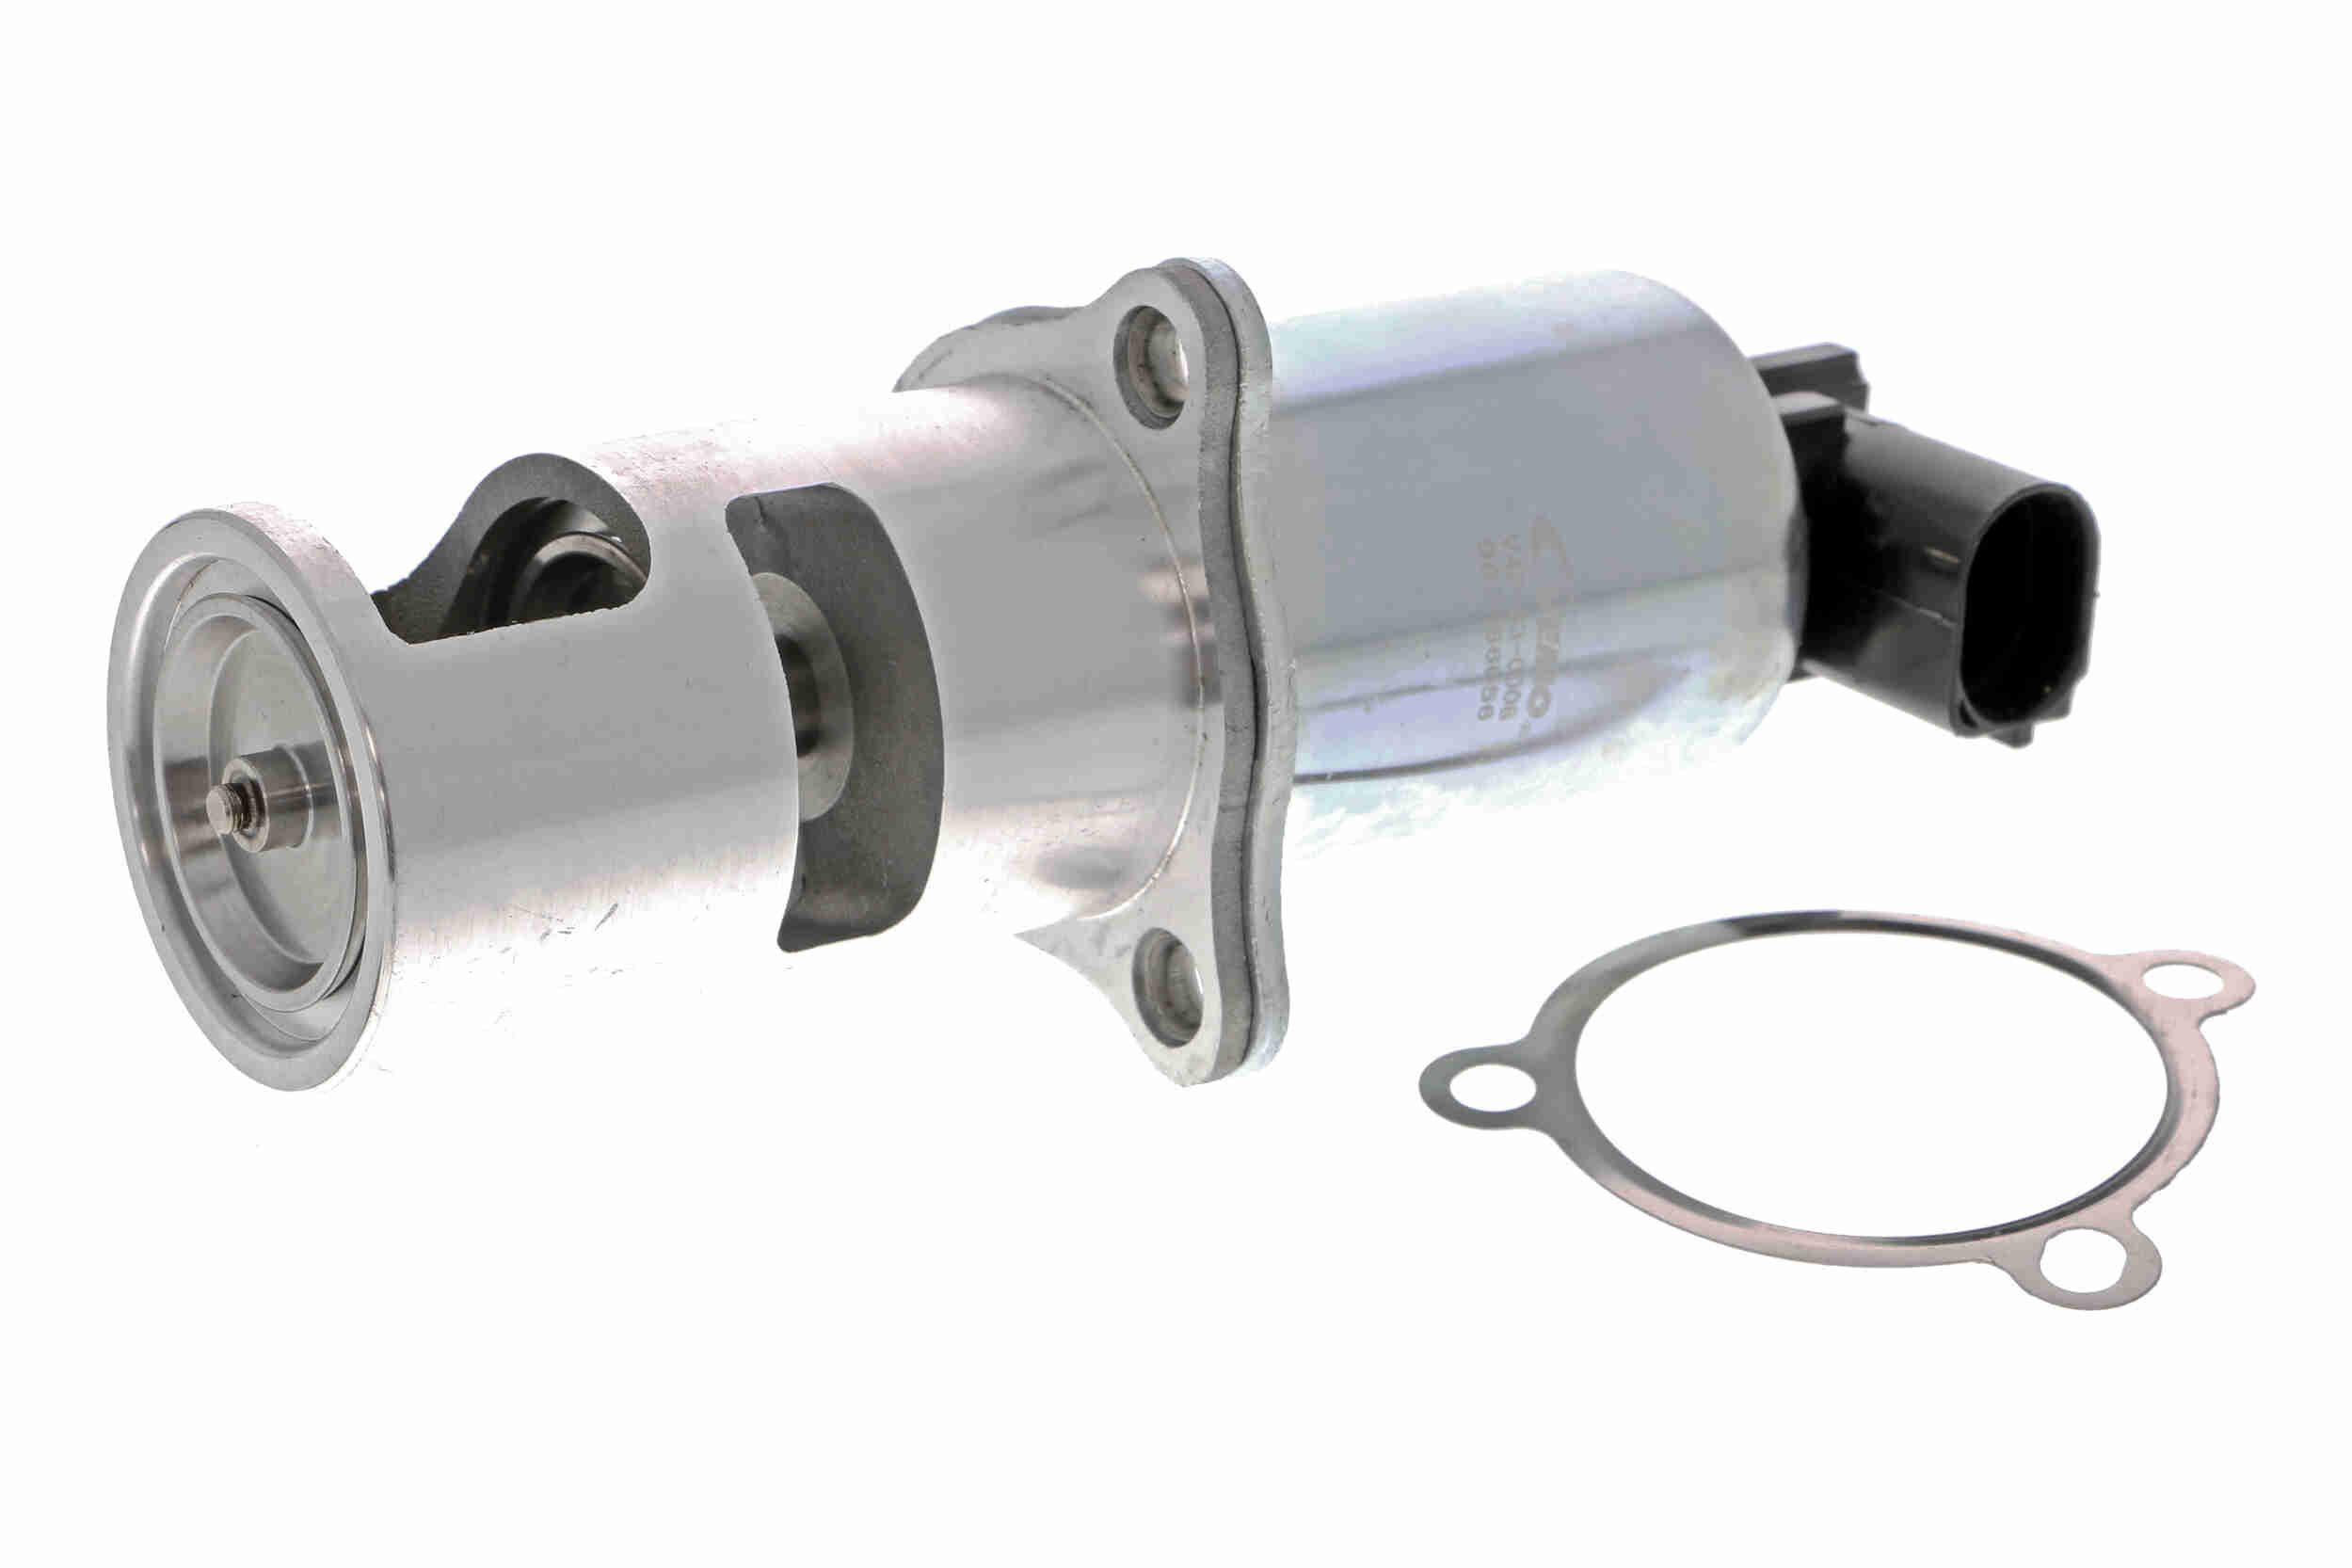 Abgasrückführung VEMO V40-63-0008